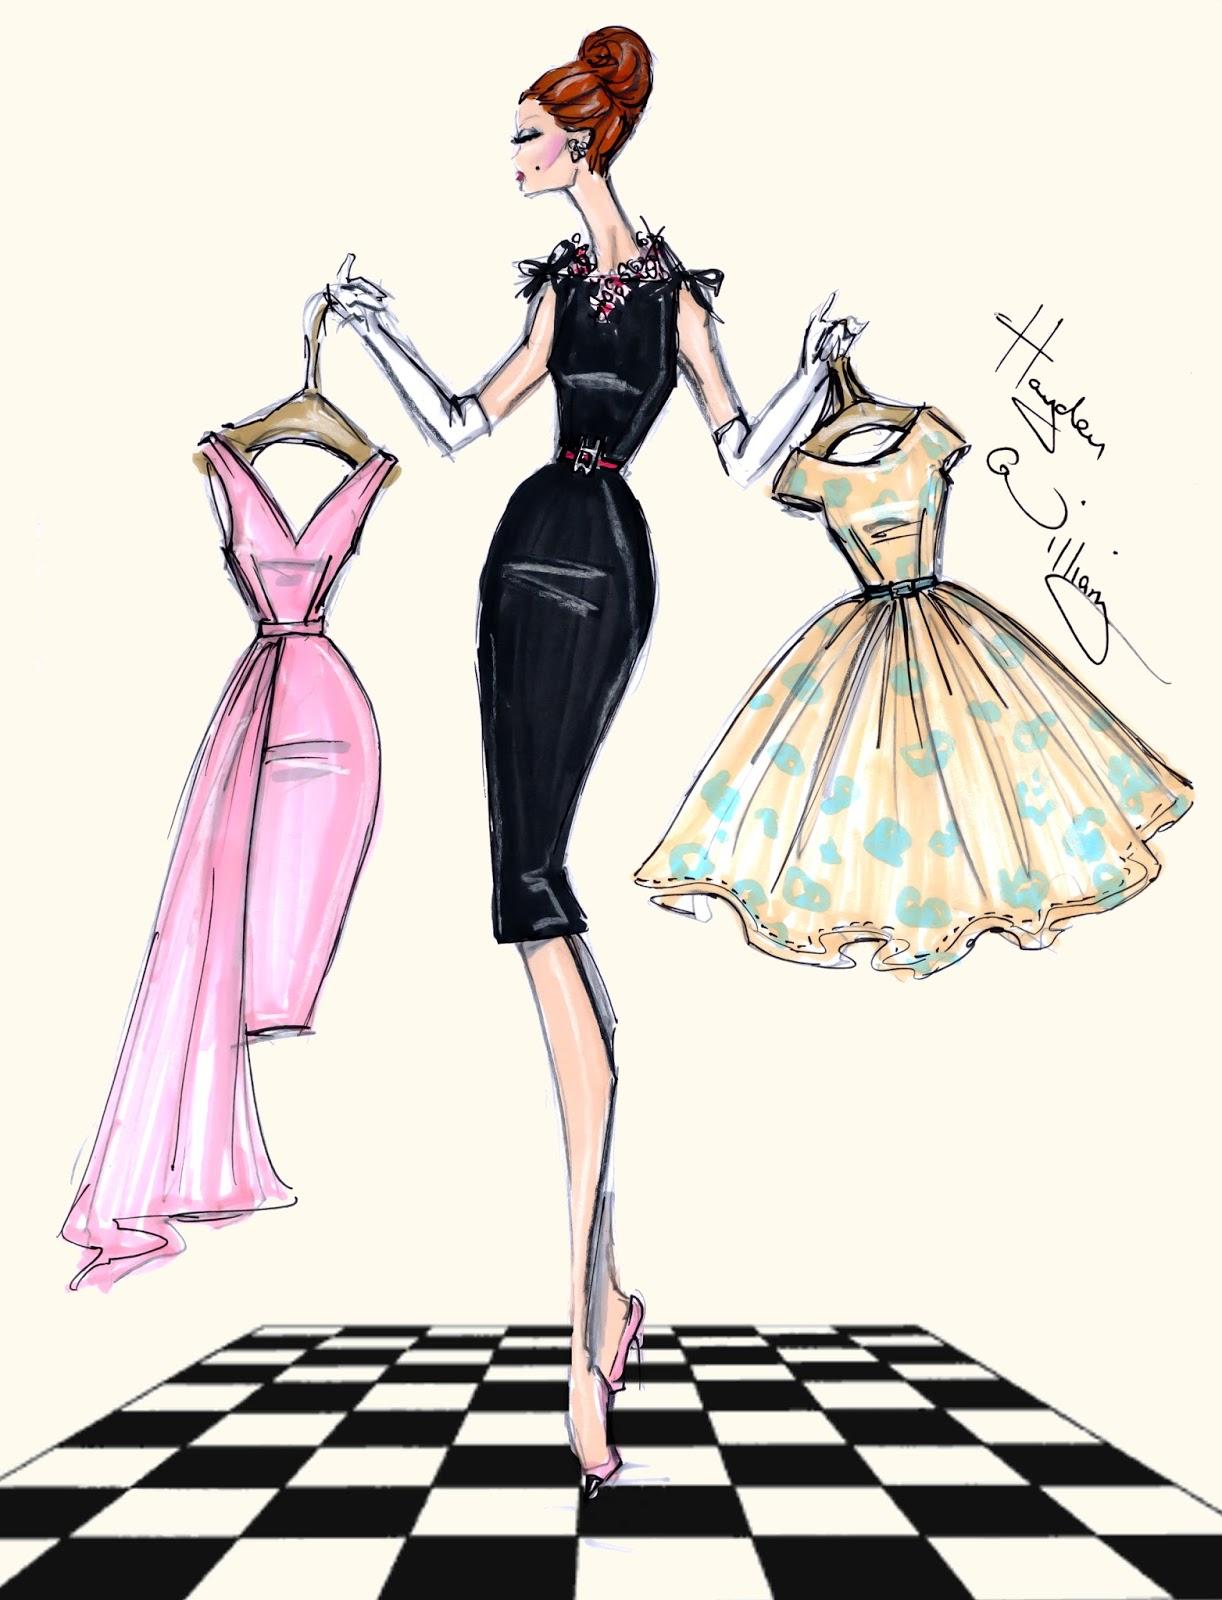 Dress Designs Drawings 2013 Hayden Williams Fashio...